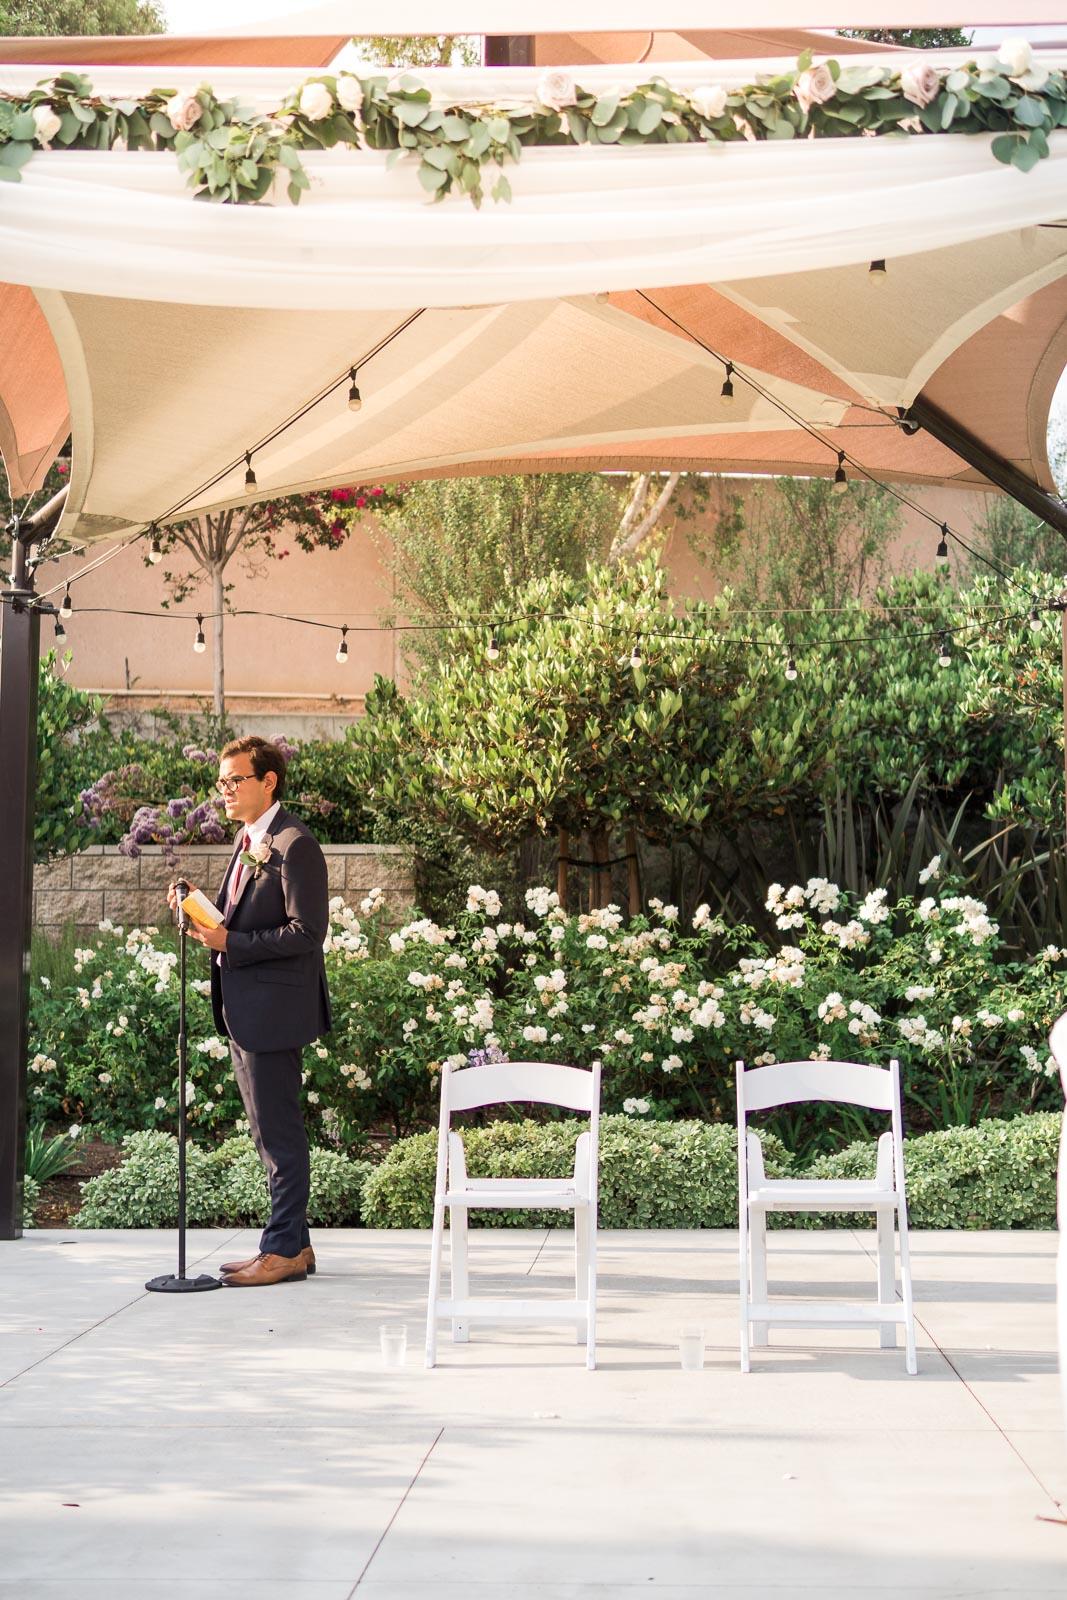 127_Angel-Brea-Orange-County_Joseph-Barber-Wedding-Photography.jpg